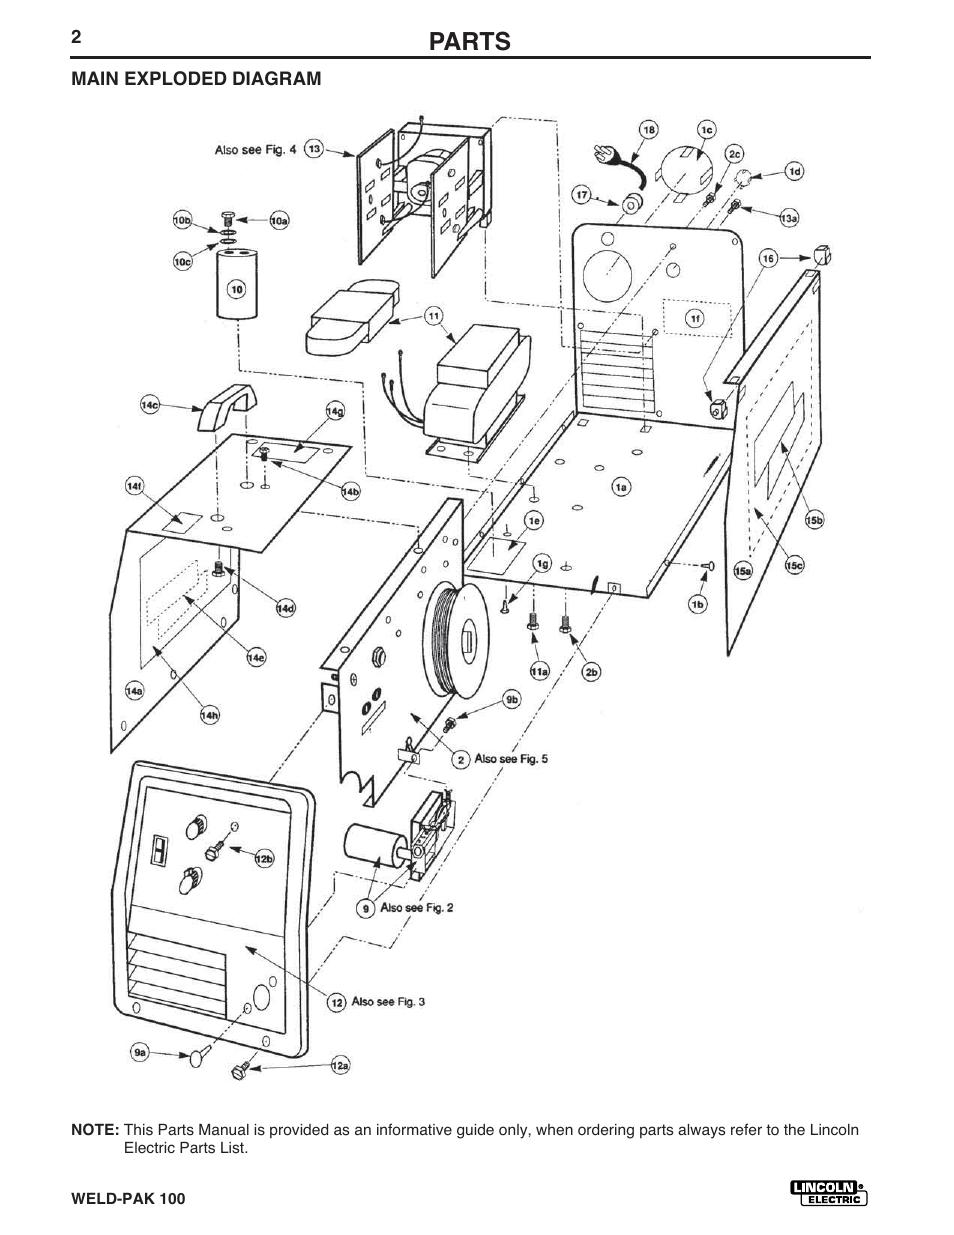 Lincoln Sa 250 Welder Wiring Diagram On Sa 200 Welder Wiring Diagram